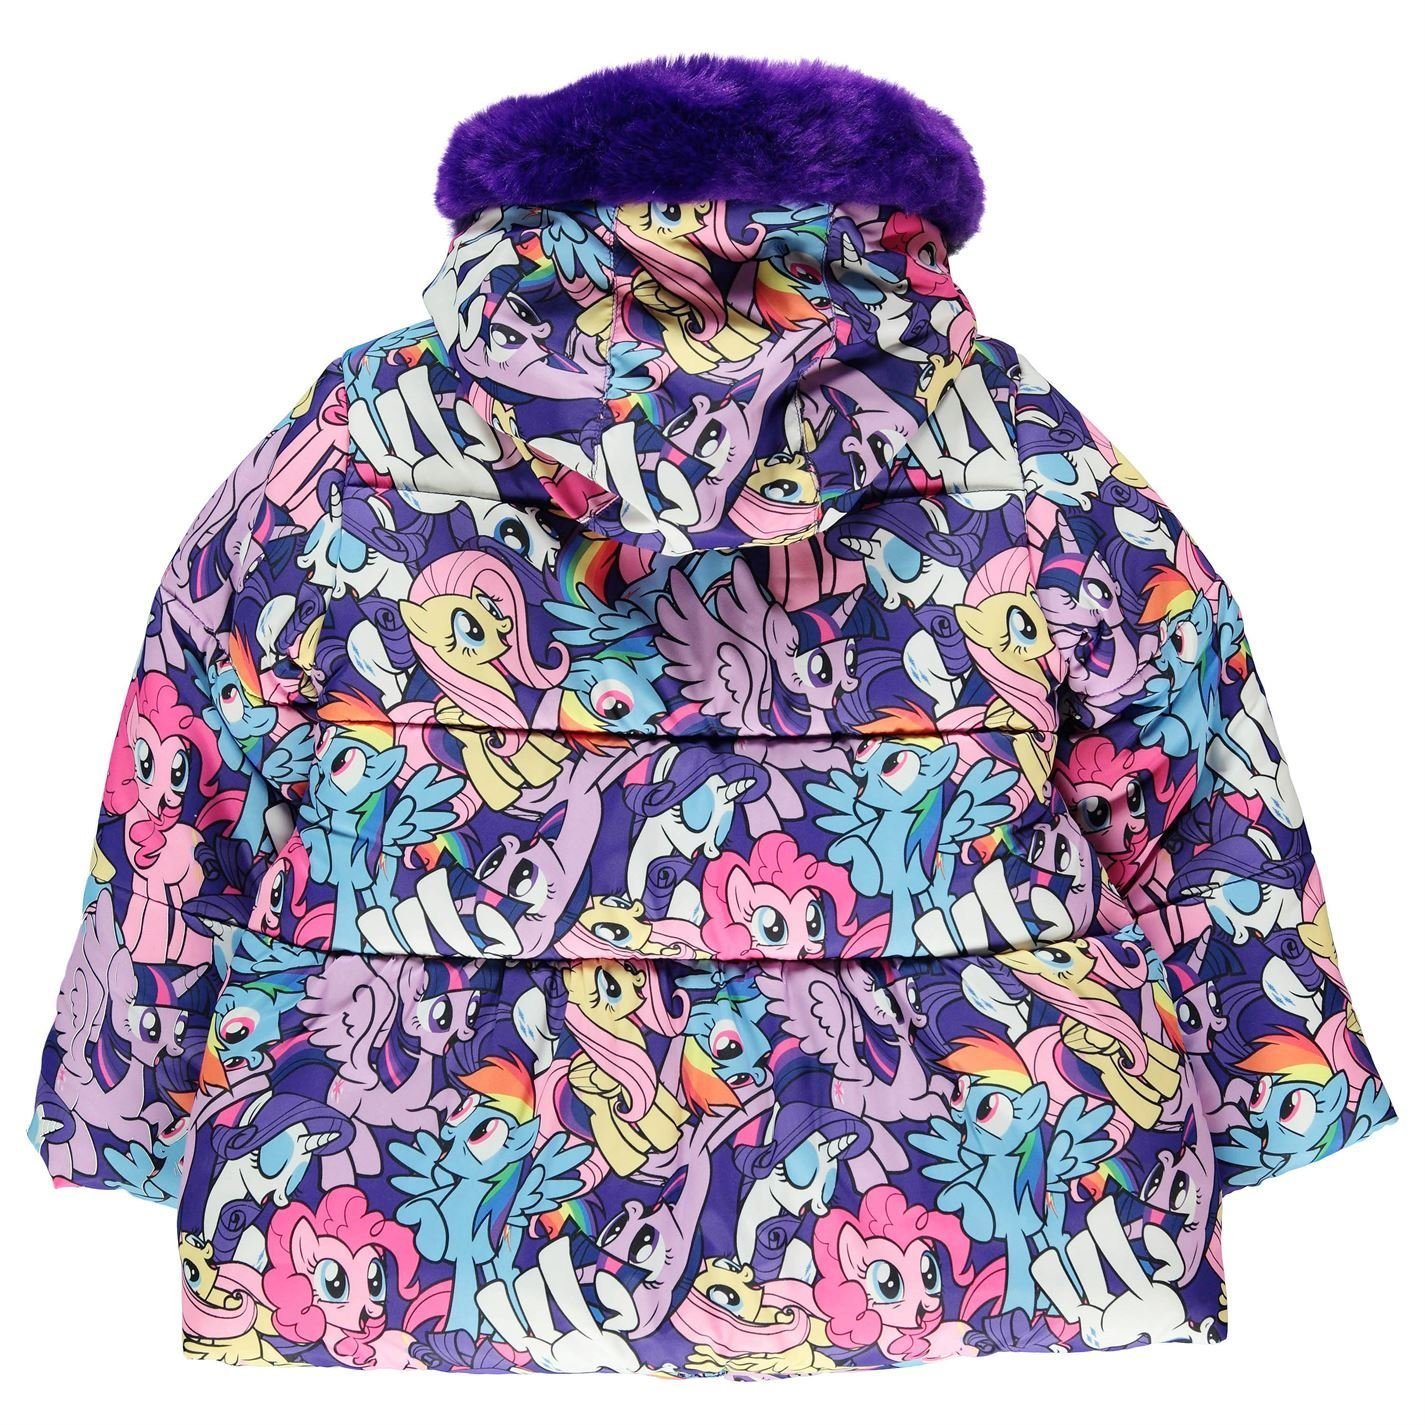 9b7c045c9ef1 My Little Pony Padded Coat Infant Girls Purple Jacket Outerwear 2-3 ...